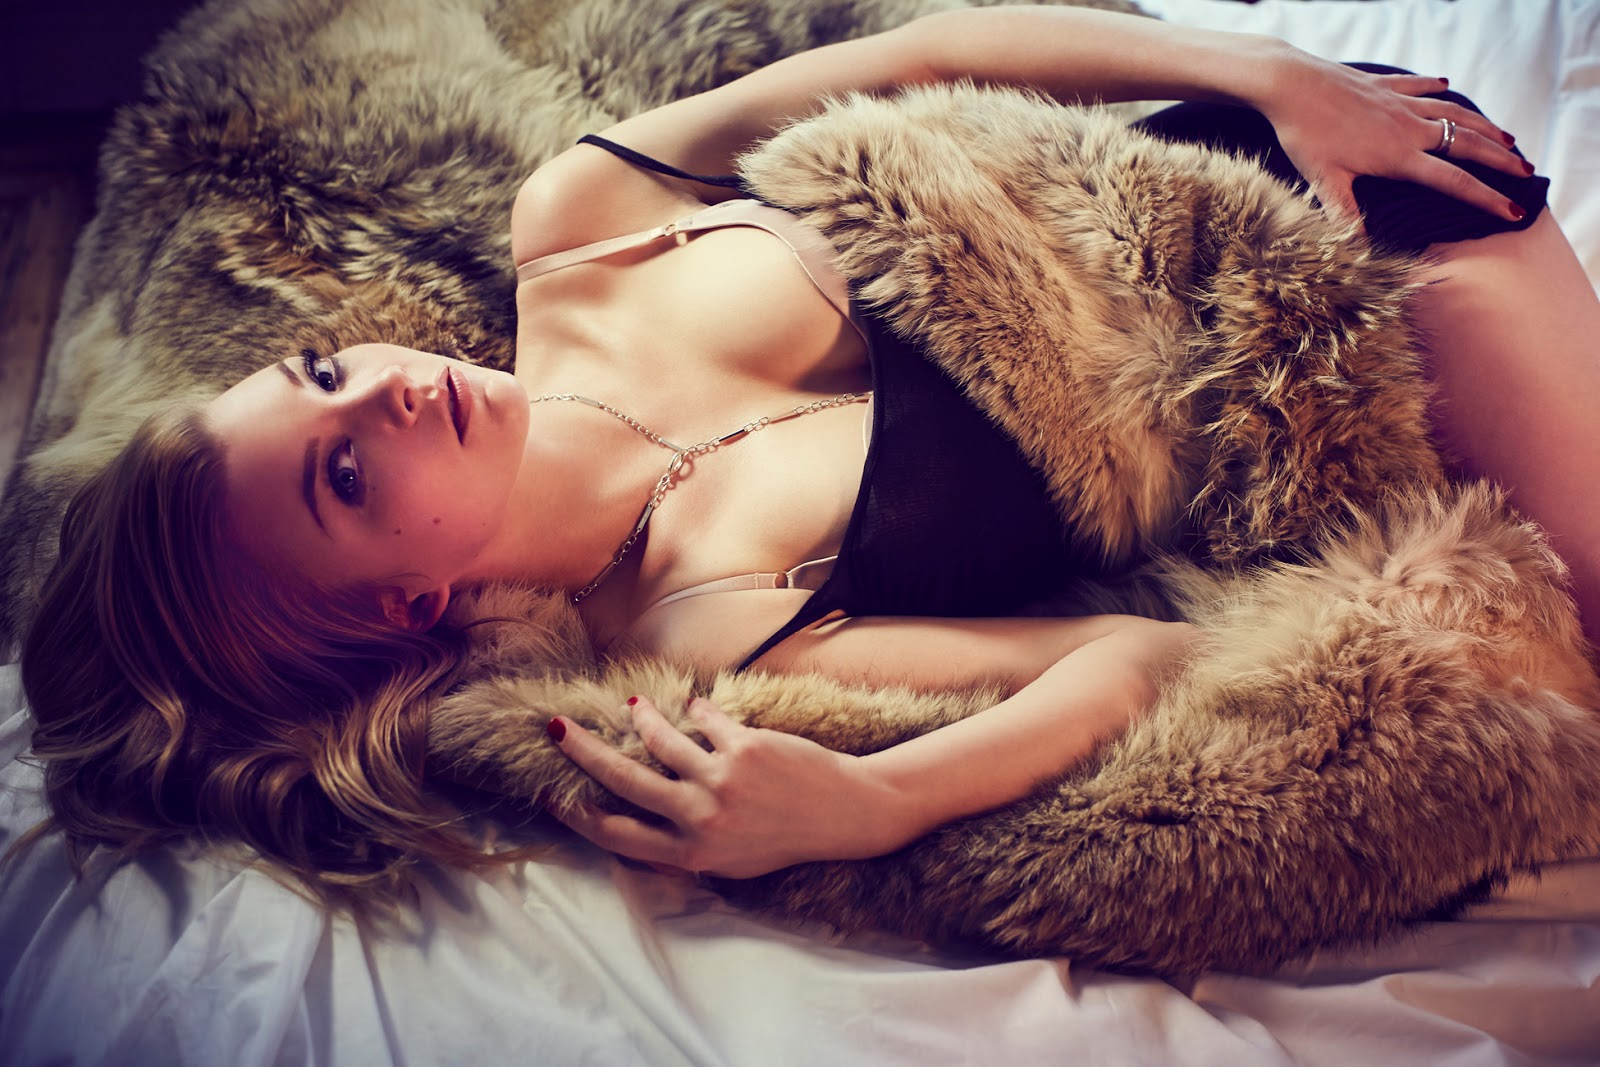 Model Photos: Natalie Dormer - Will Davidson Photoshoot